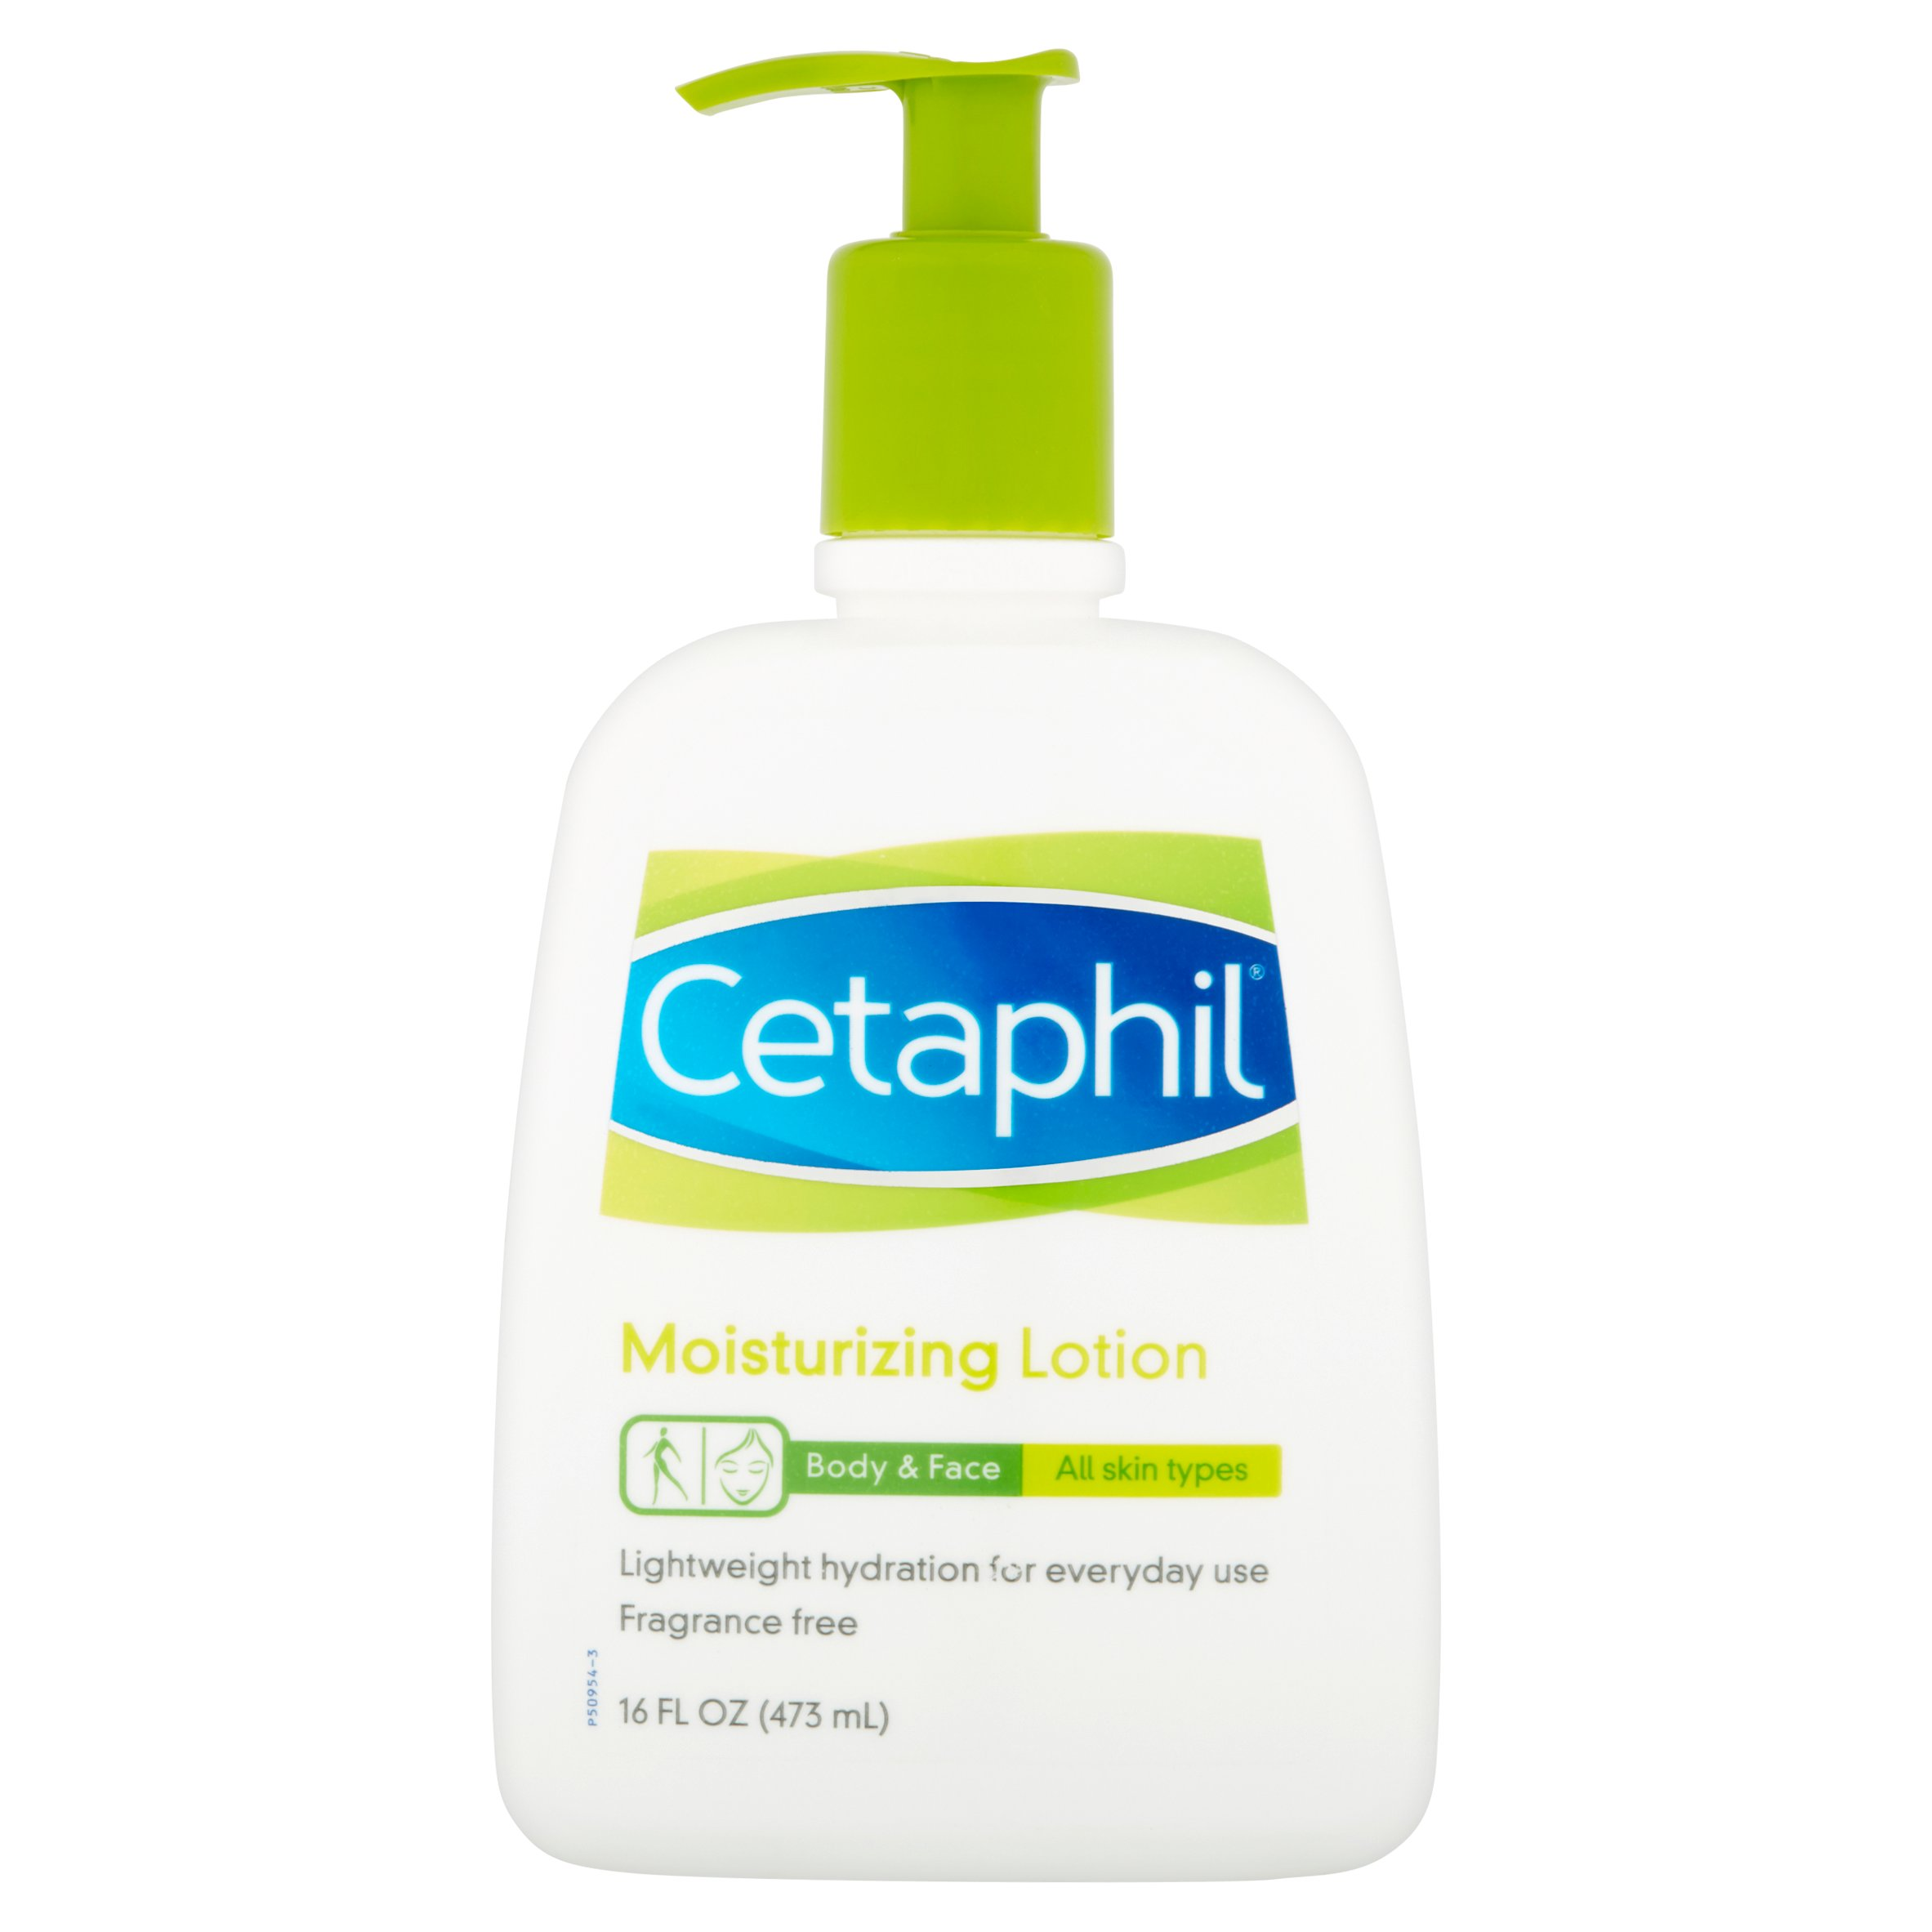 Cetaphil Fragrance Free Moisturizing Lotion, 16-Ounce Bottles